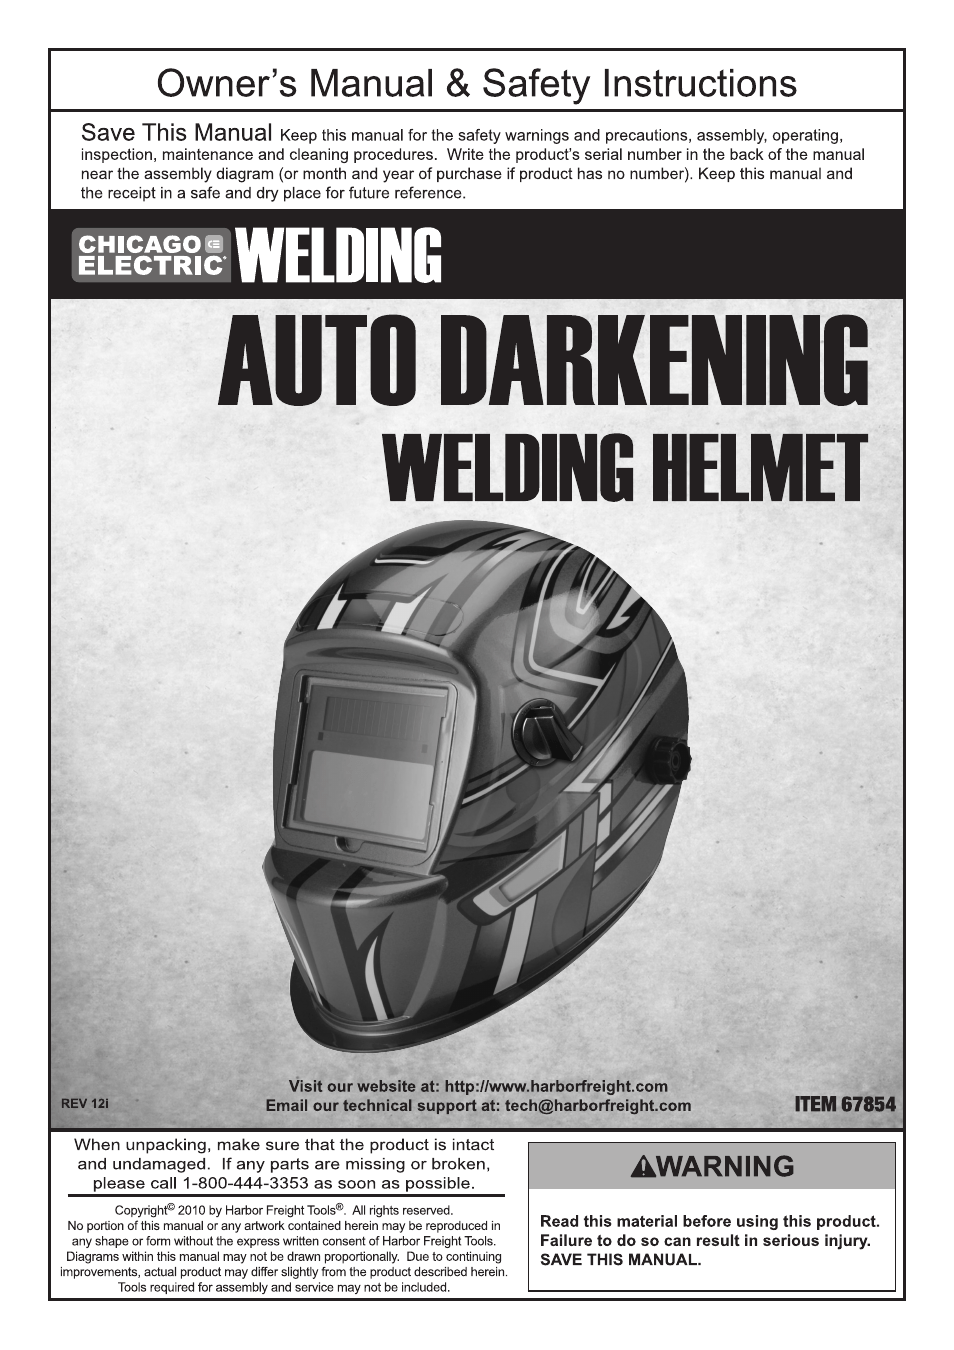 Chicago Electric Auto Darkening Welding Helmet 67854 User